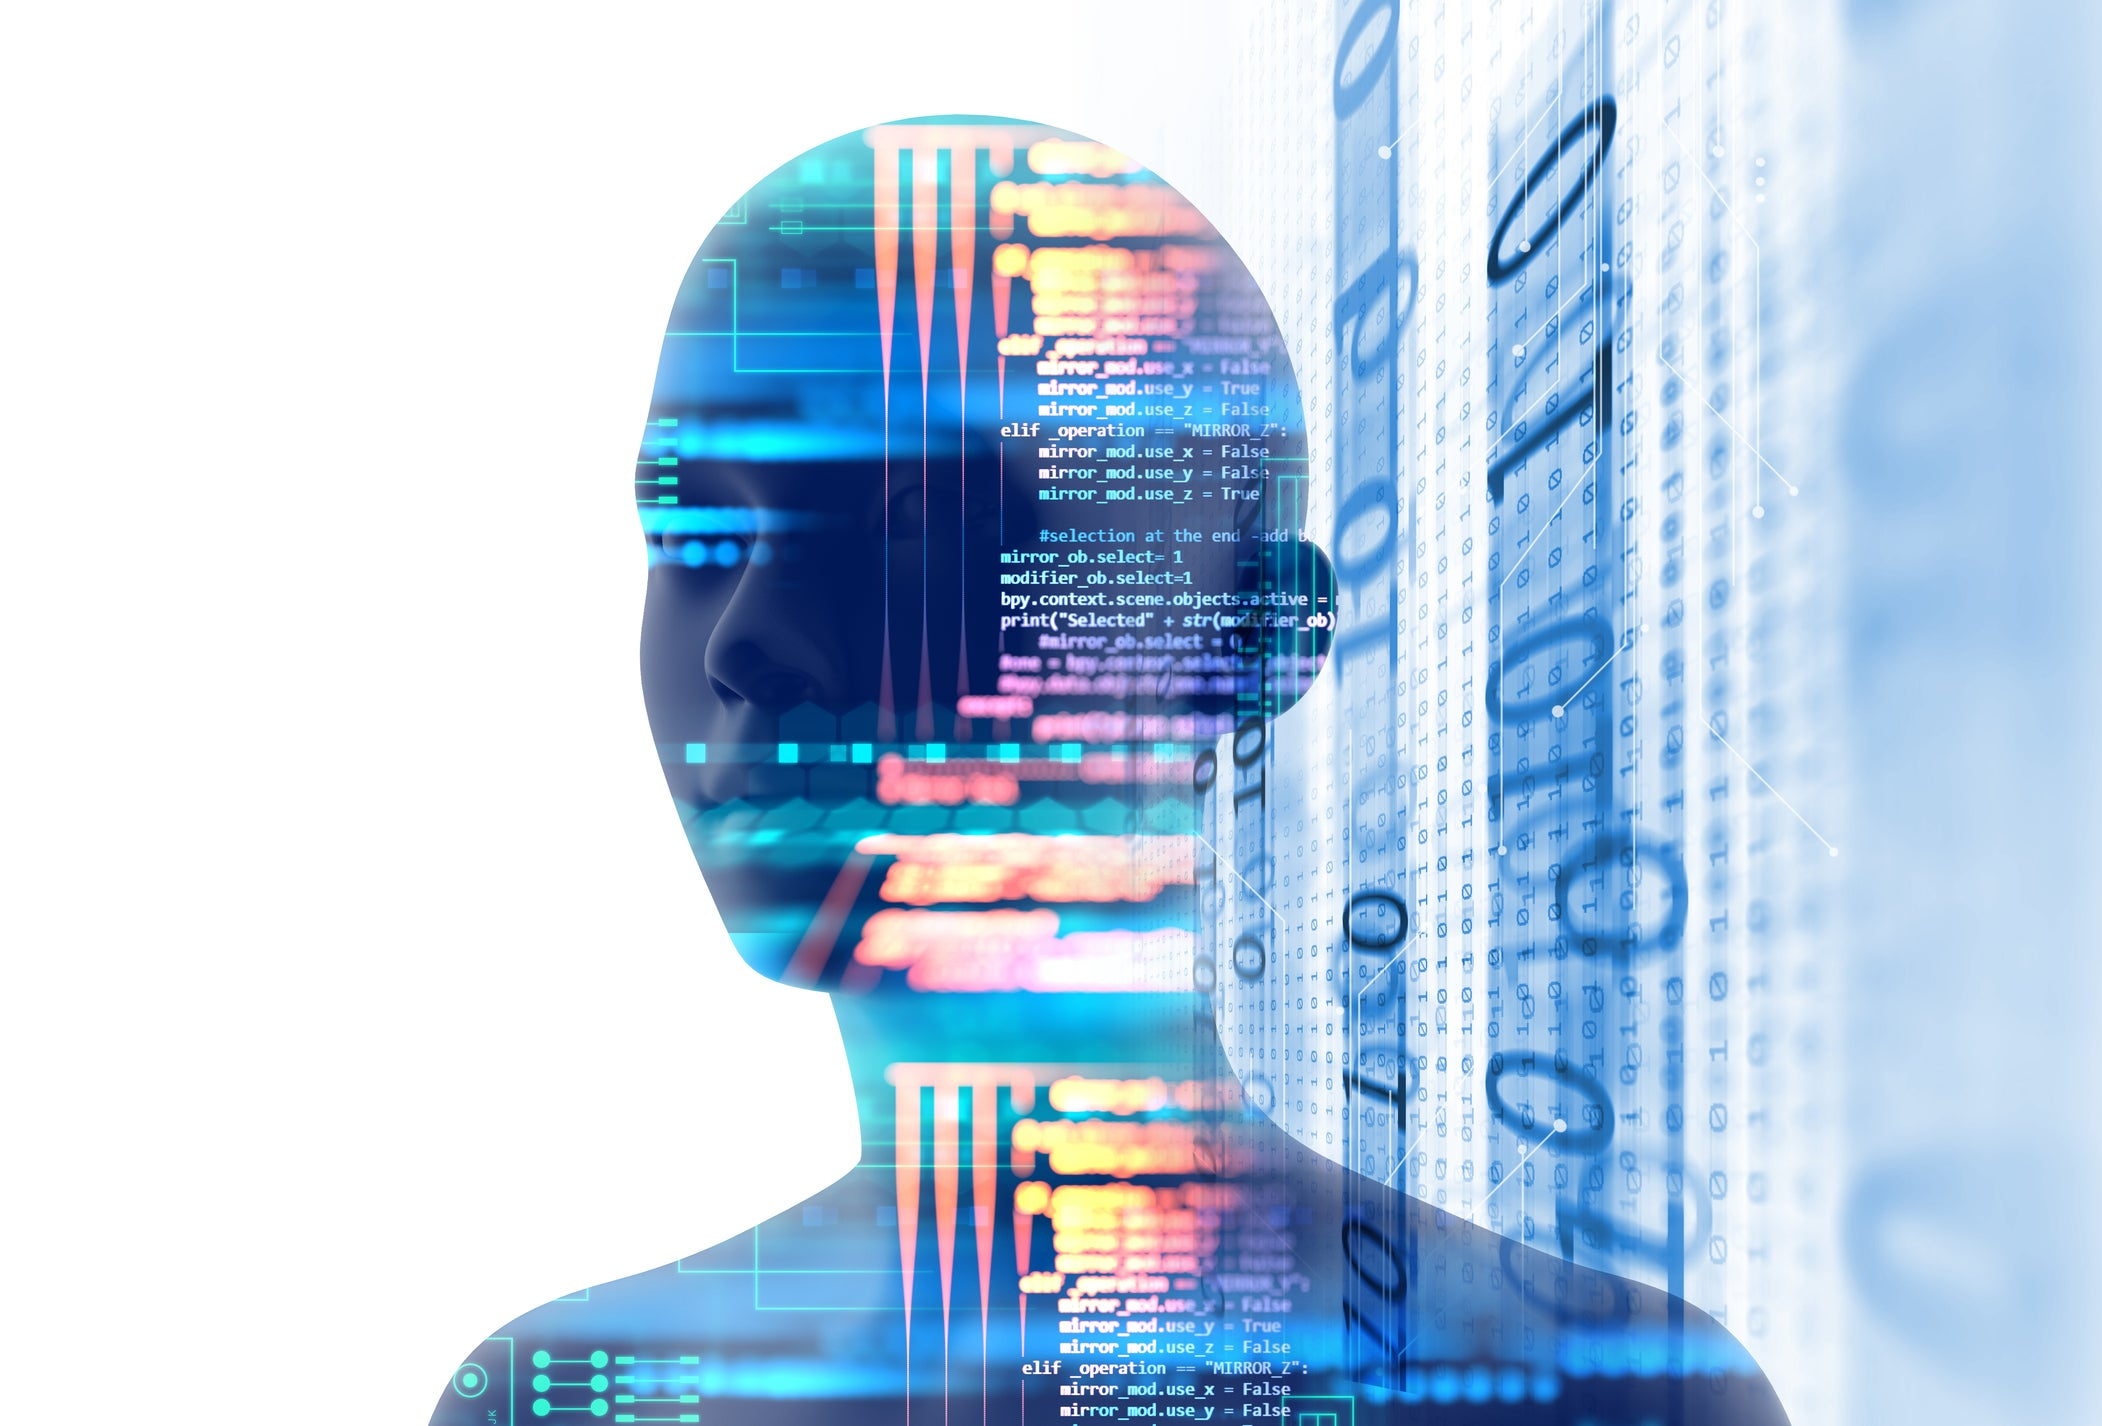 digital technology vision artificial intelligence